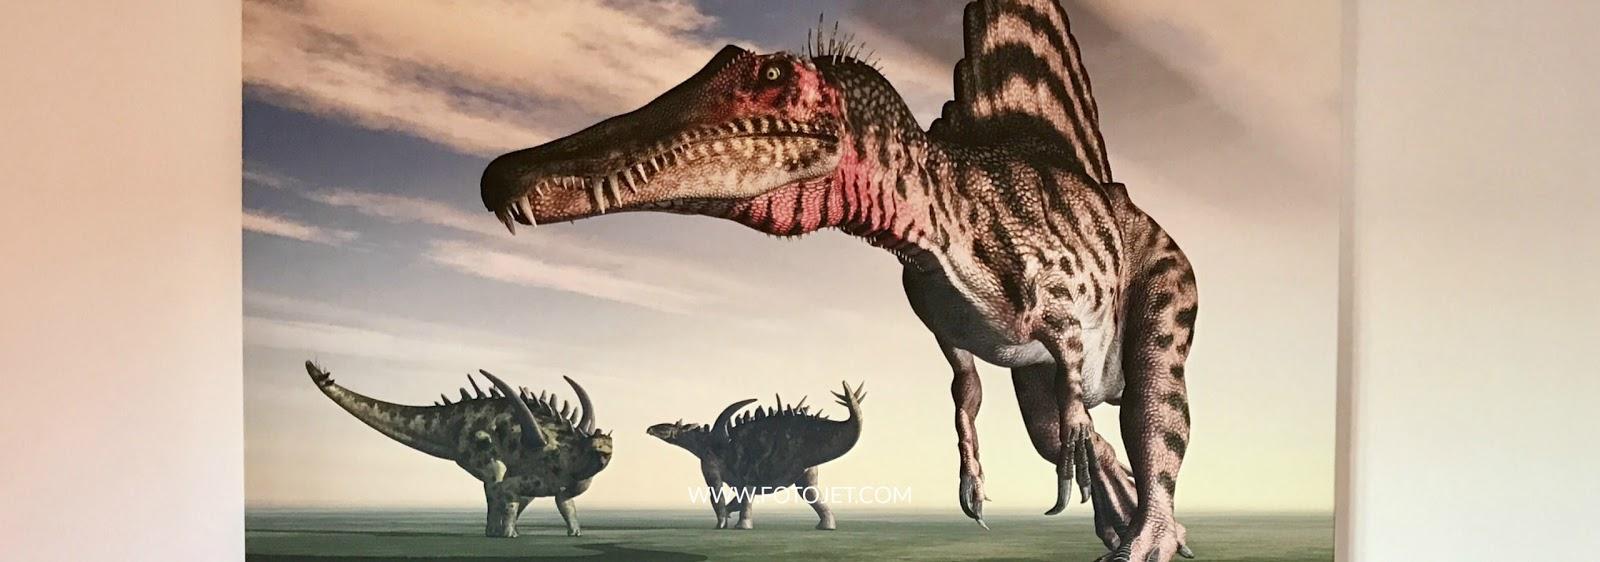 dinosaur canvas keeps my child dreaming